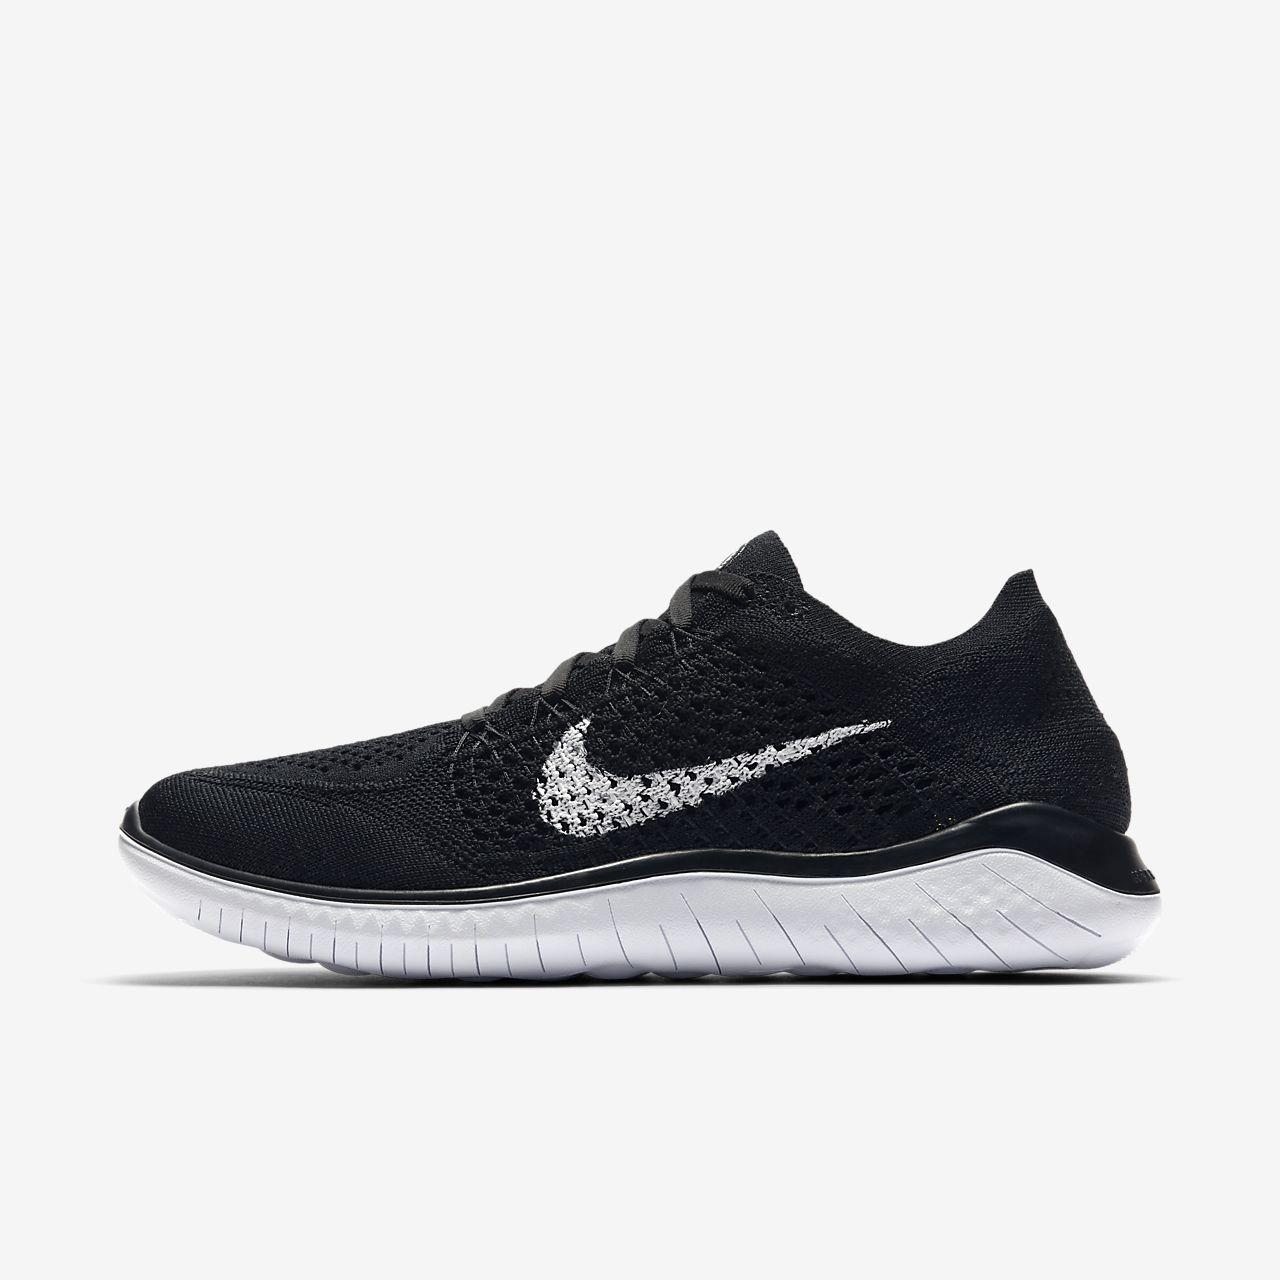 NUOVO Wmns Nike Free RN Flyknit Sneaker DONNA SCARPE JOGGING Jogging ORIGINALE